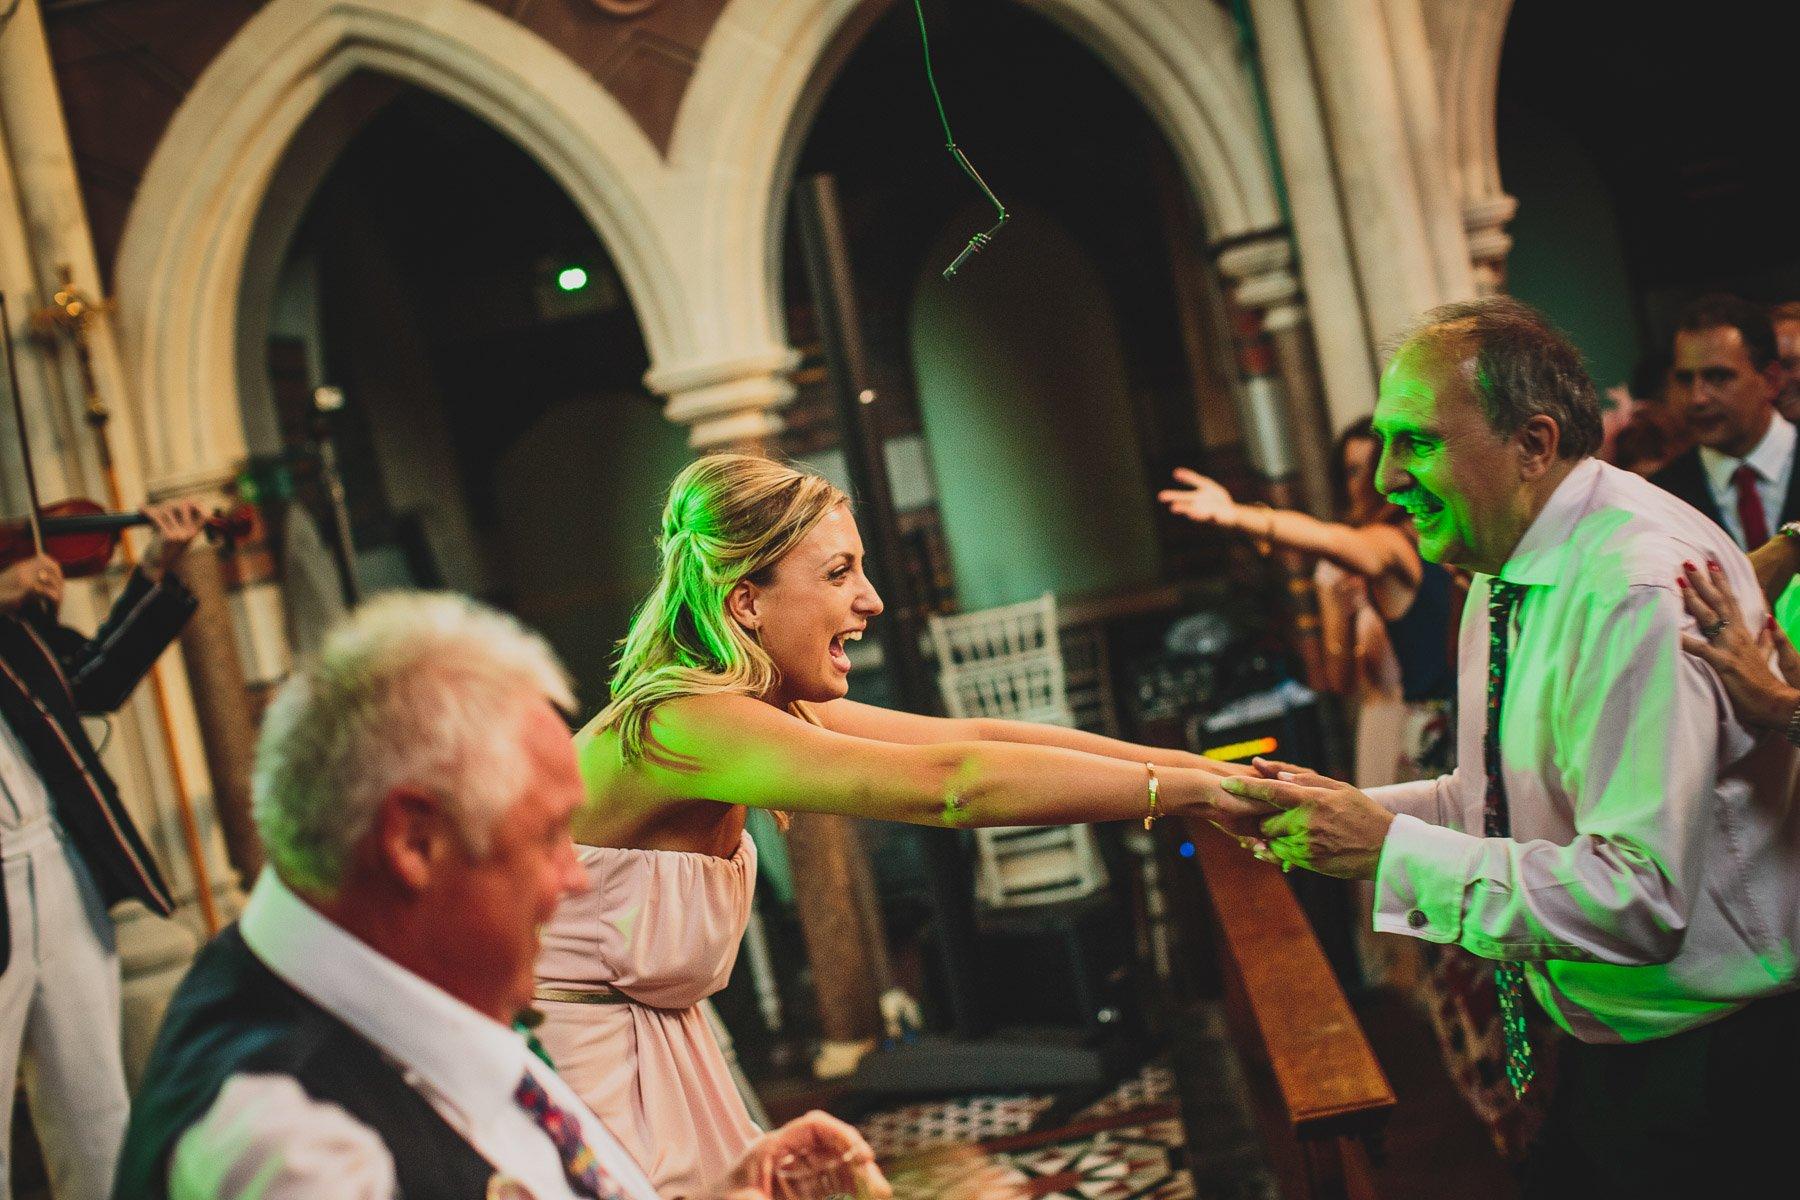 eastbourne-wedding-photography-hannah-tom-092